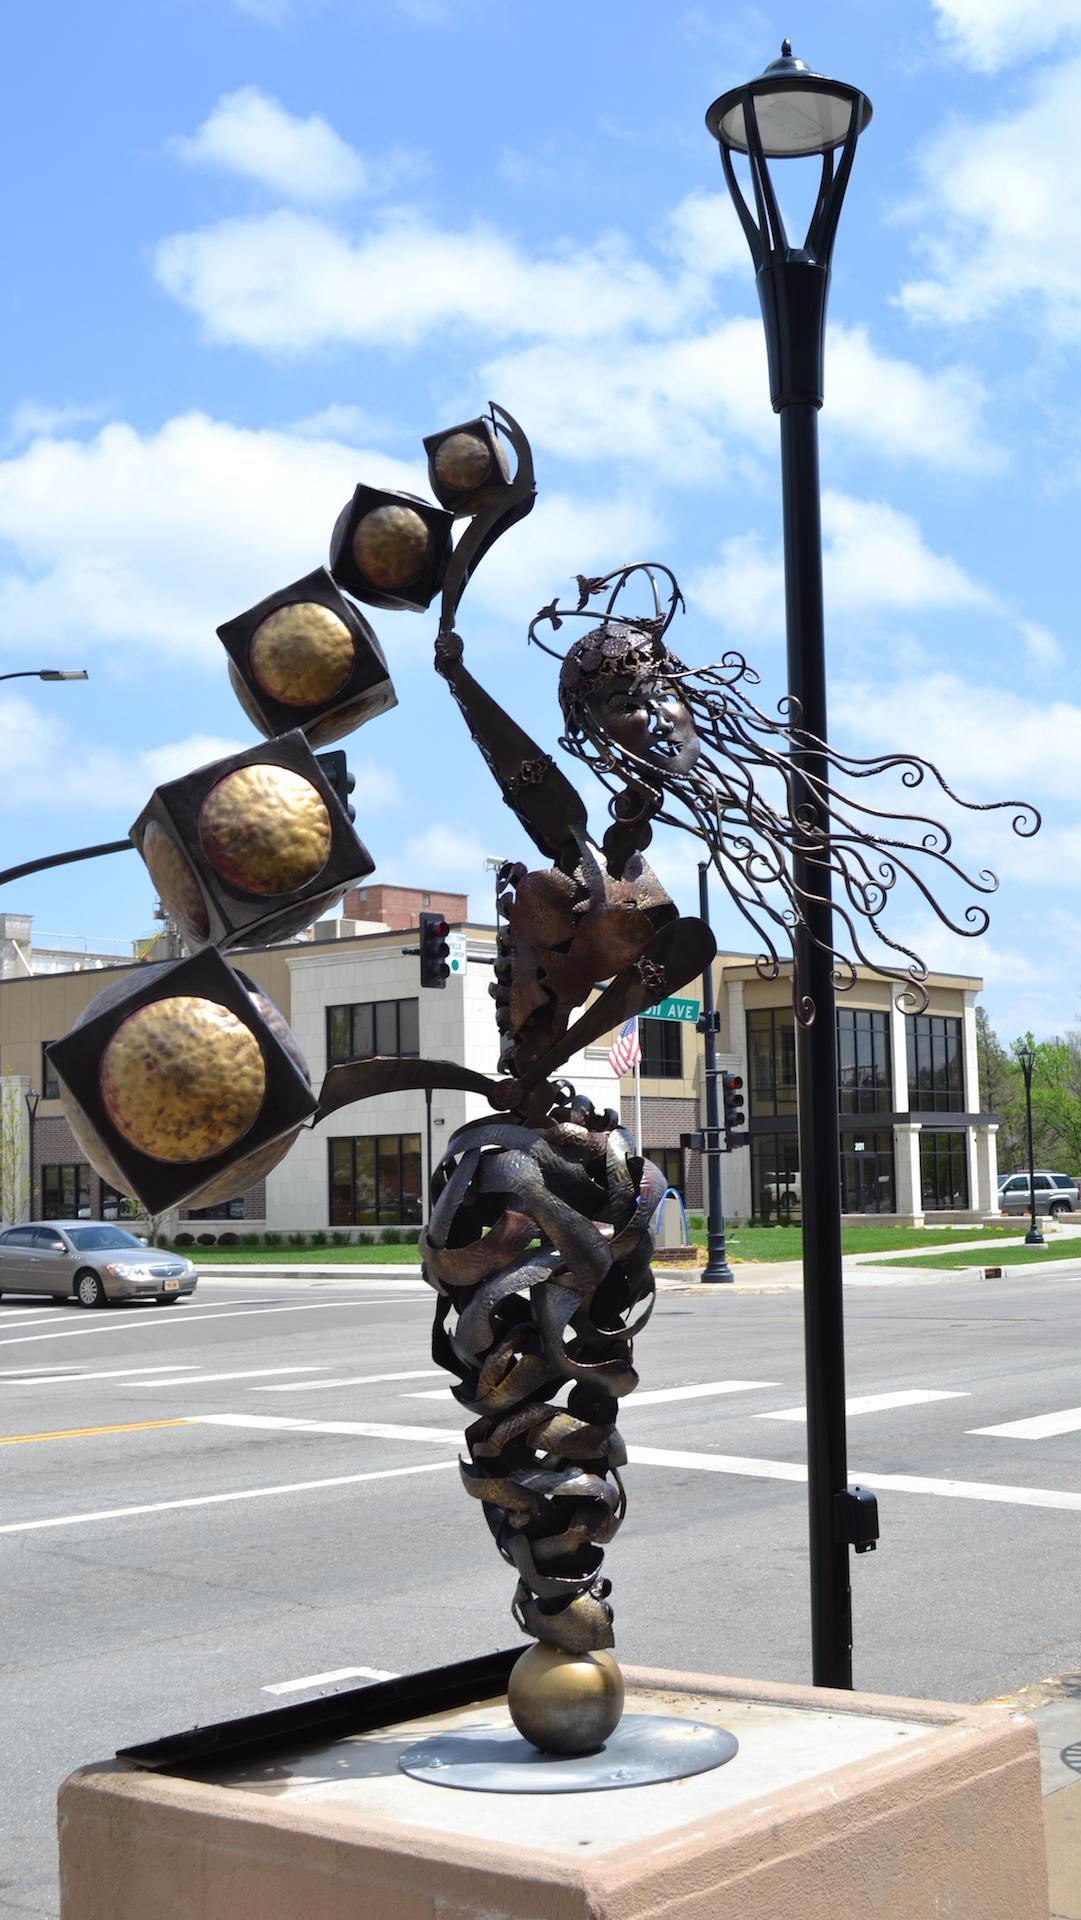 WEB_Jodie Bliss_Balancing Act - Public Sculpture, Art in Public Places: Salina, KS_2018 copy.jpeg